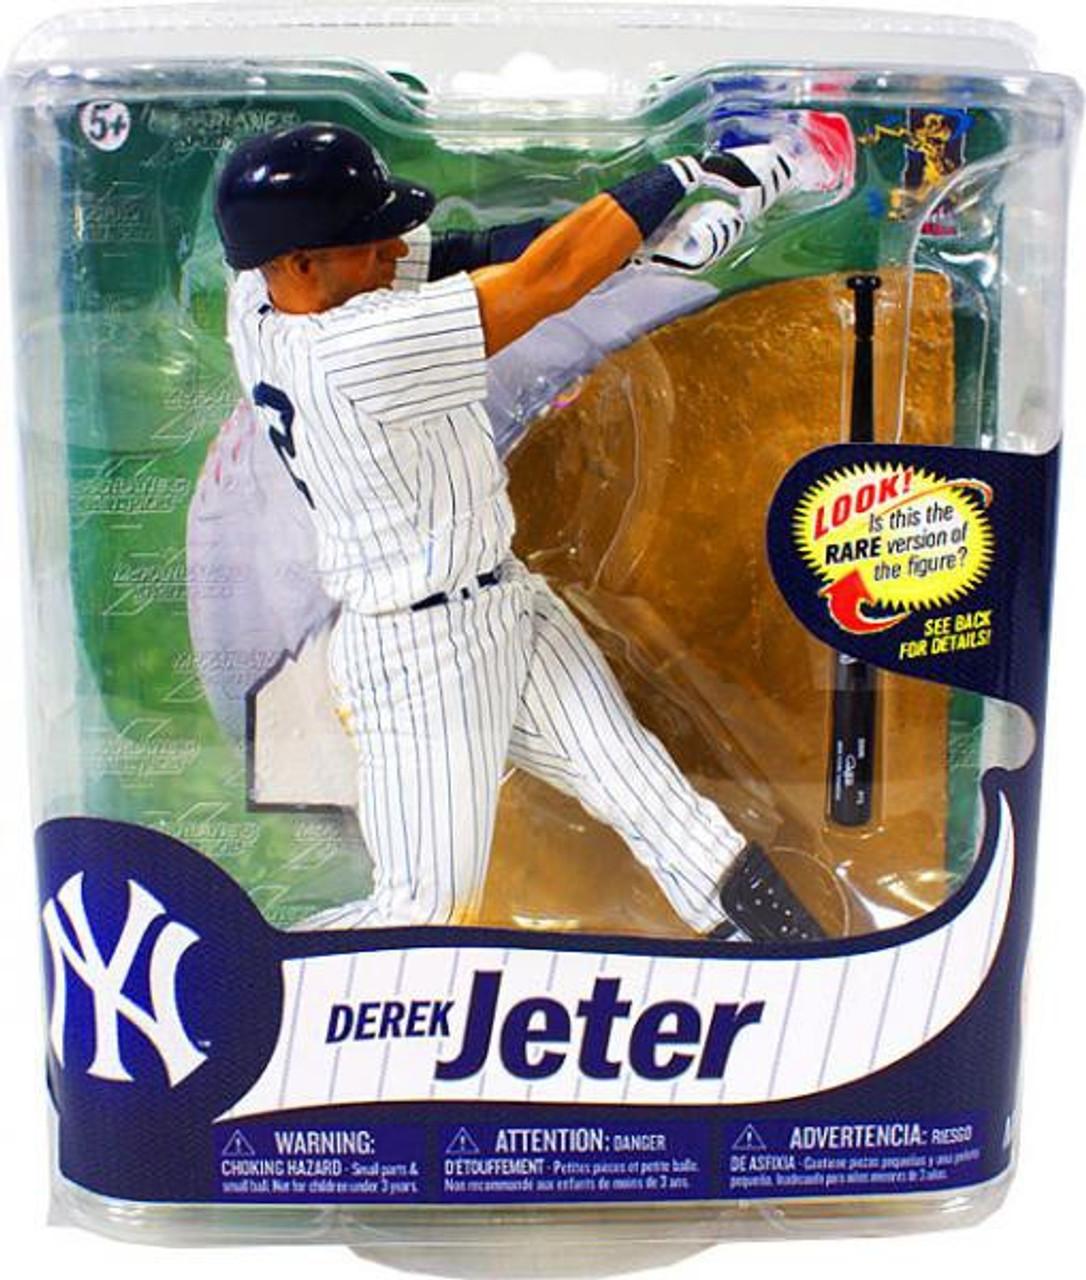 New Mcfarlane Sports Picks Derek Jeter 2010 Action Figure New York Yankees